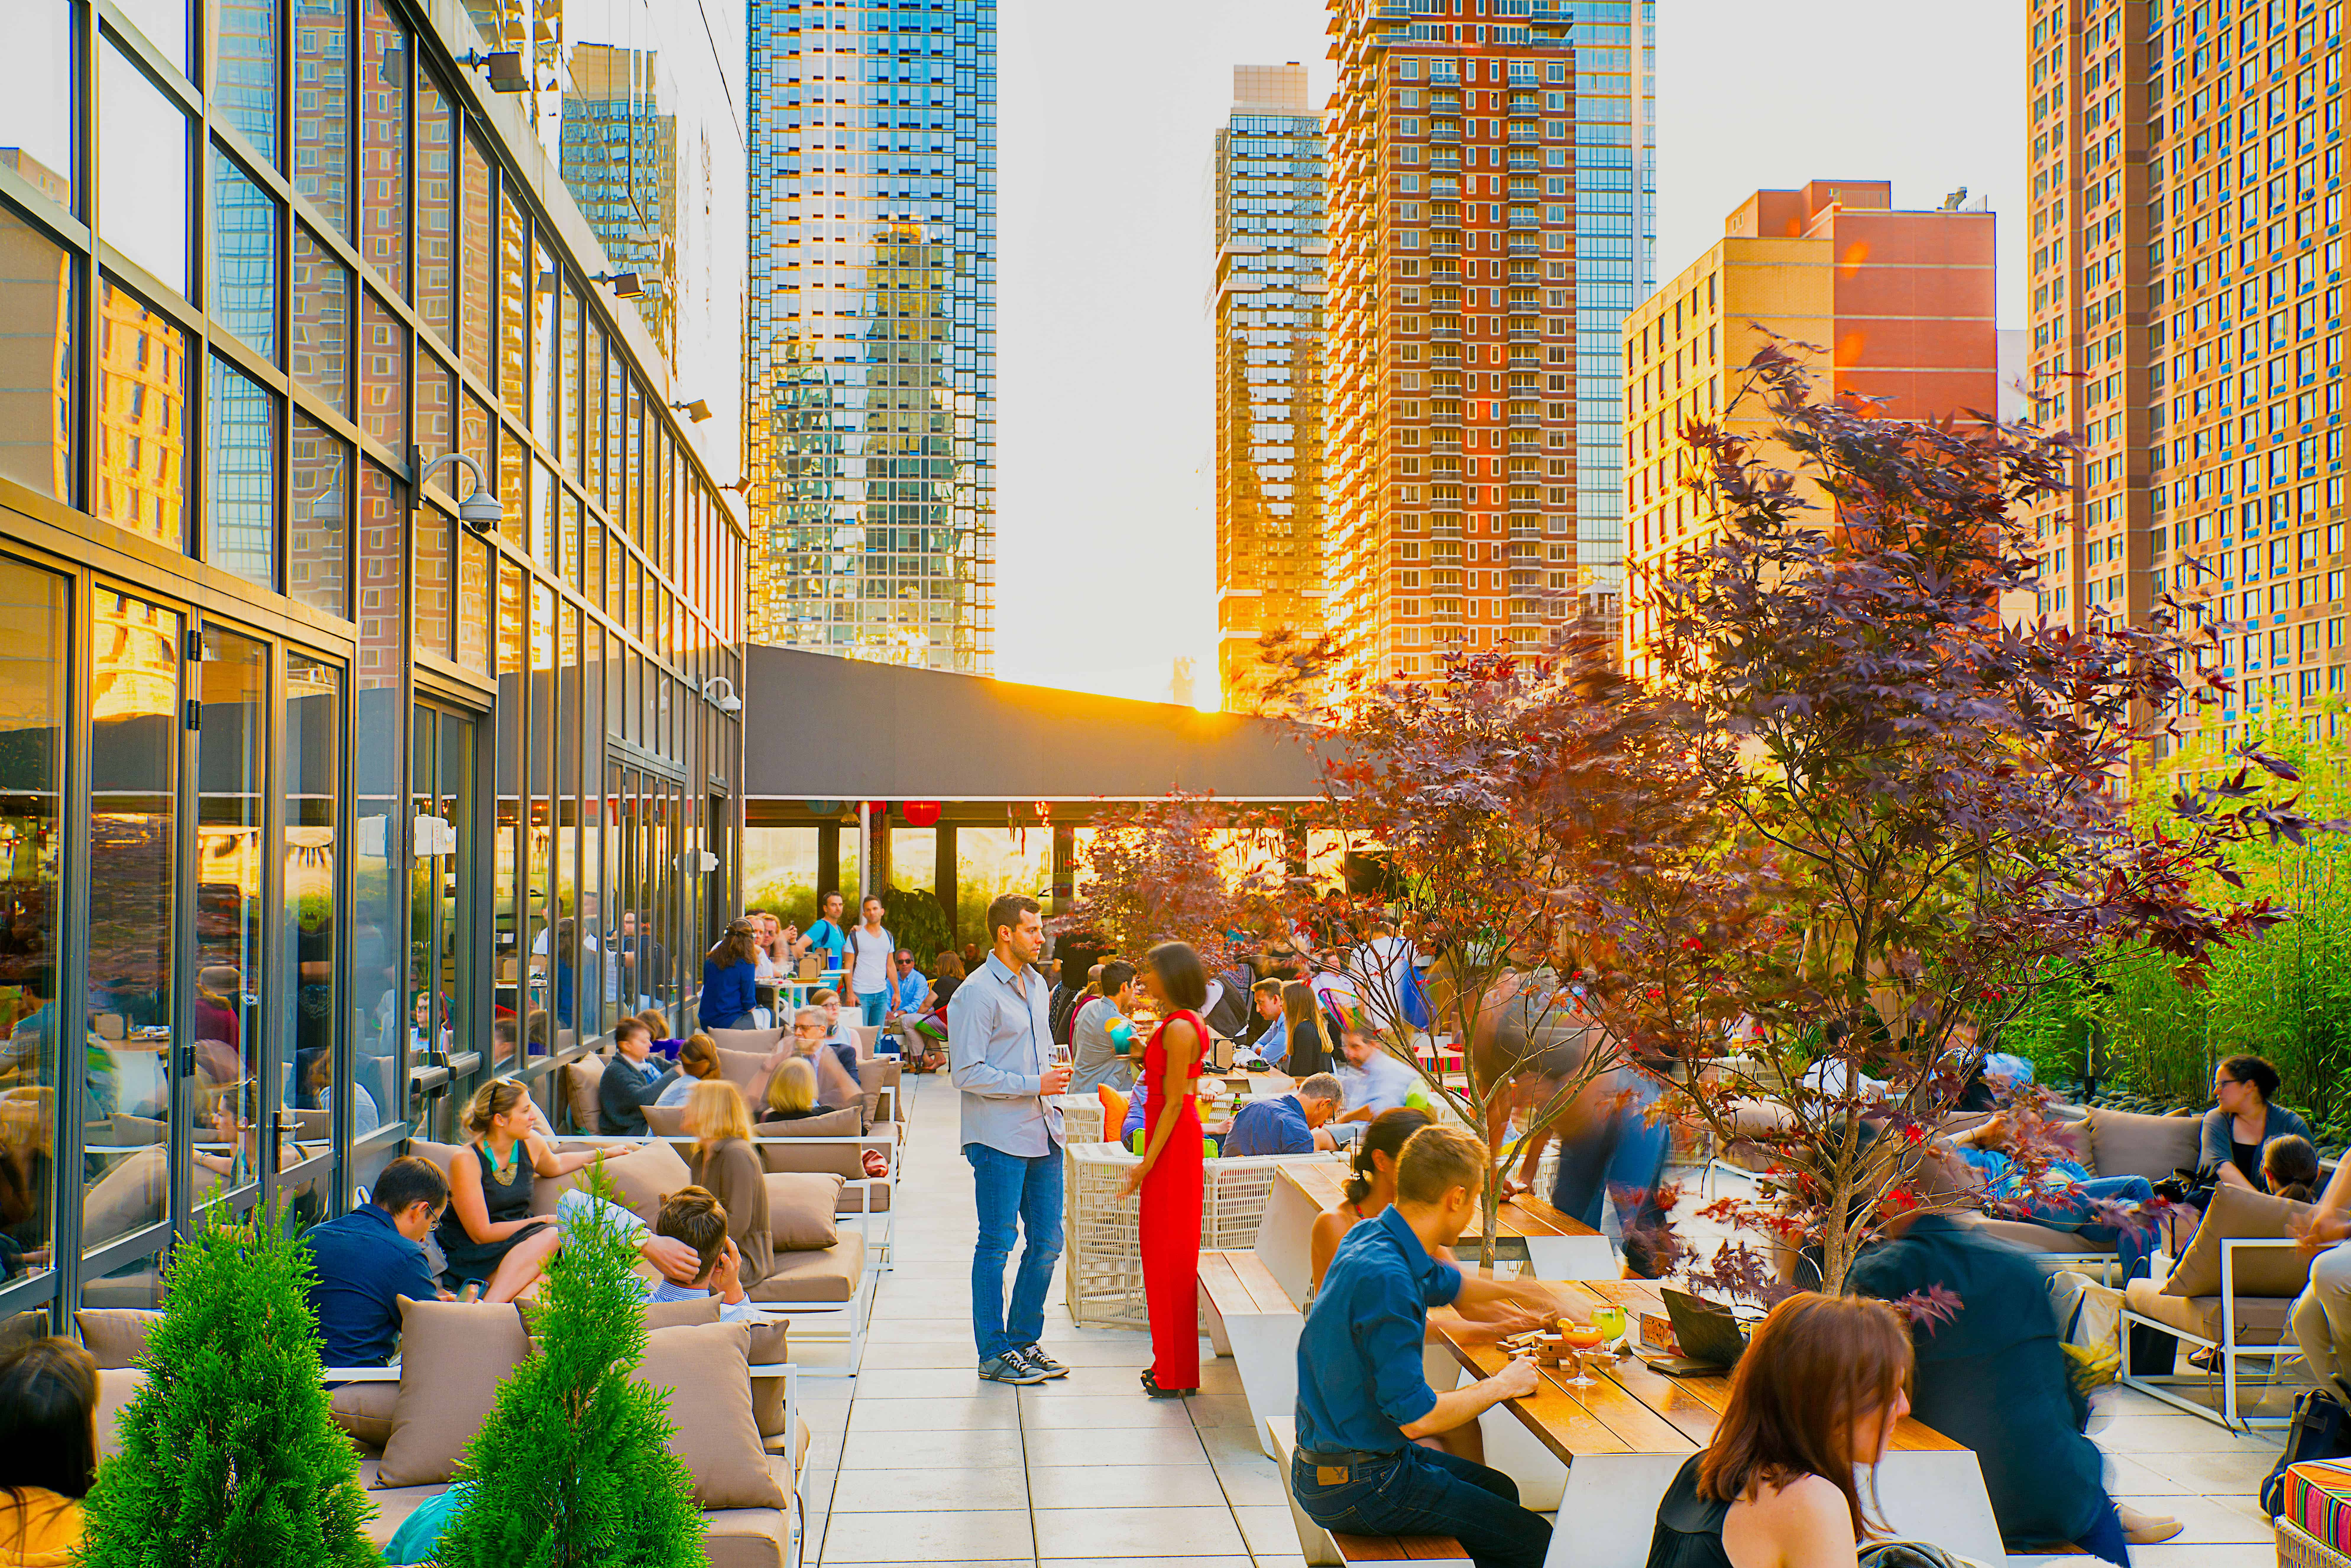 YOTEL Midtown Manhattan Rooftop Terrace